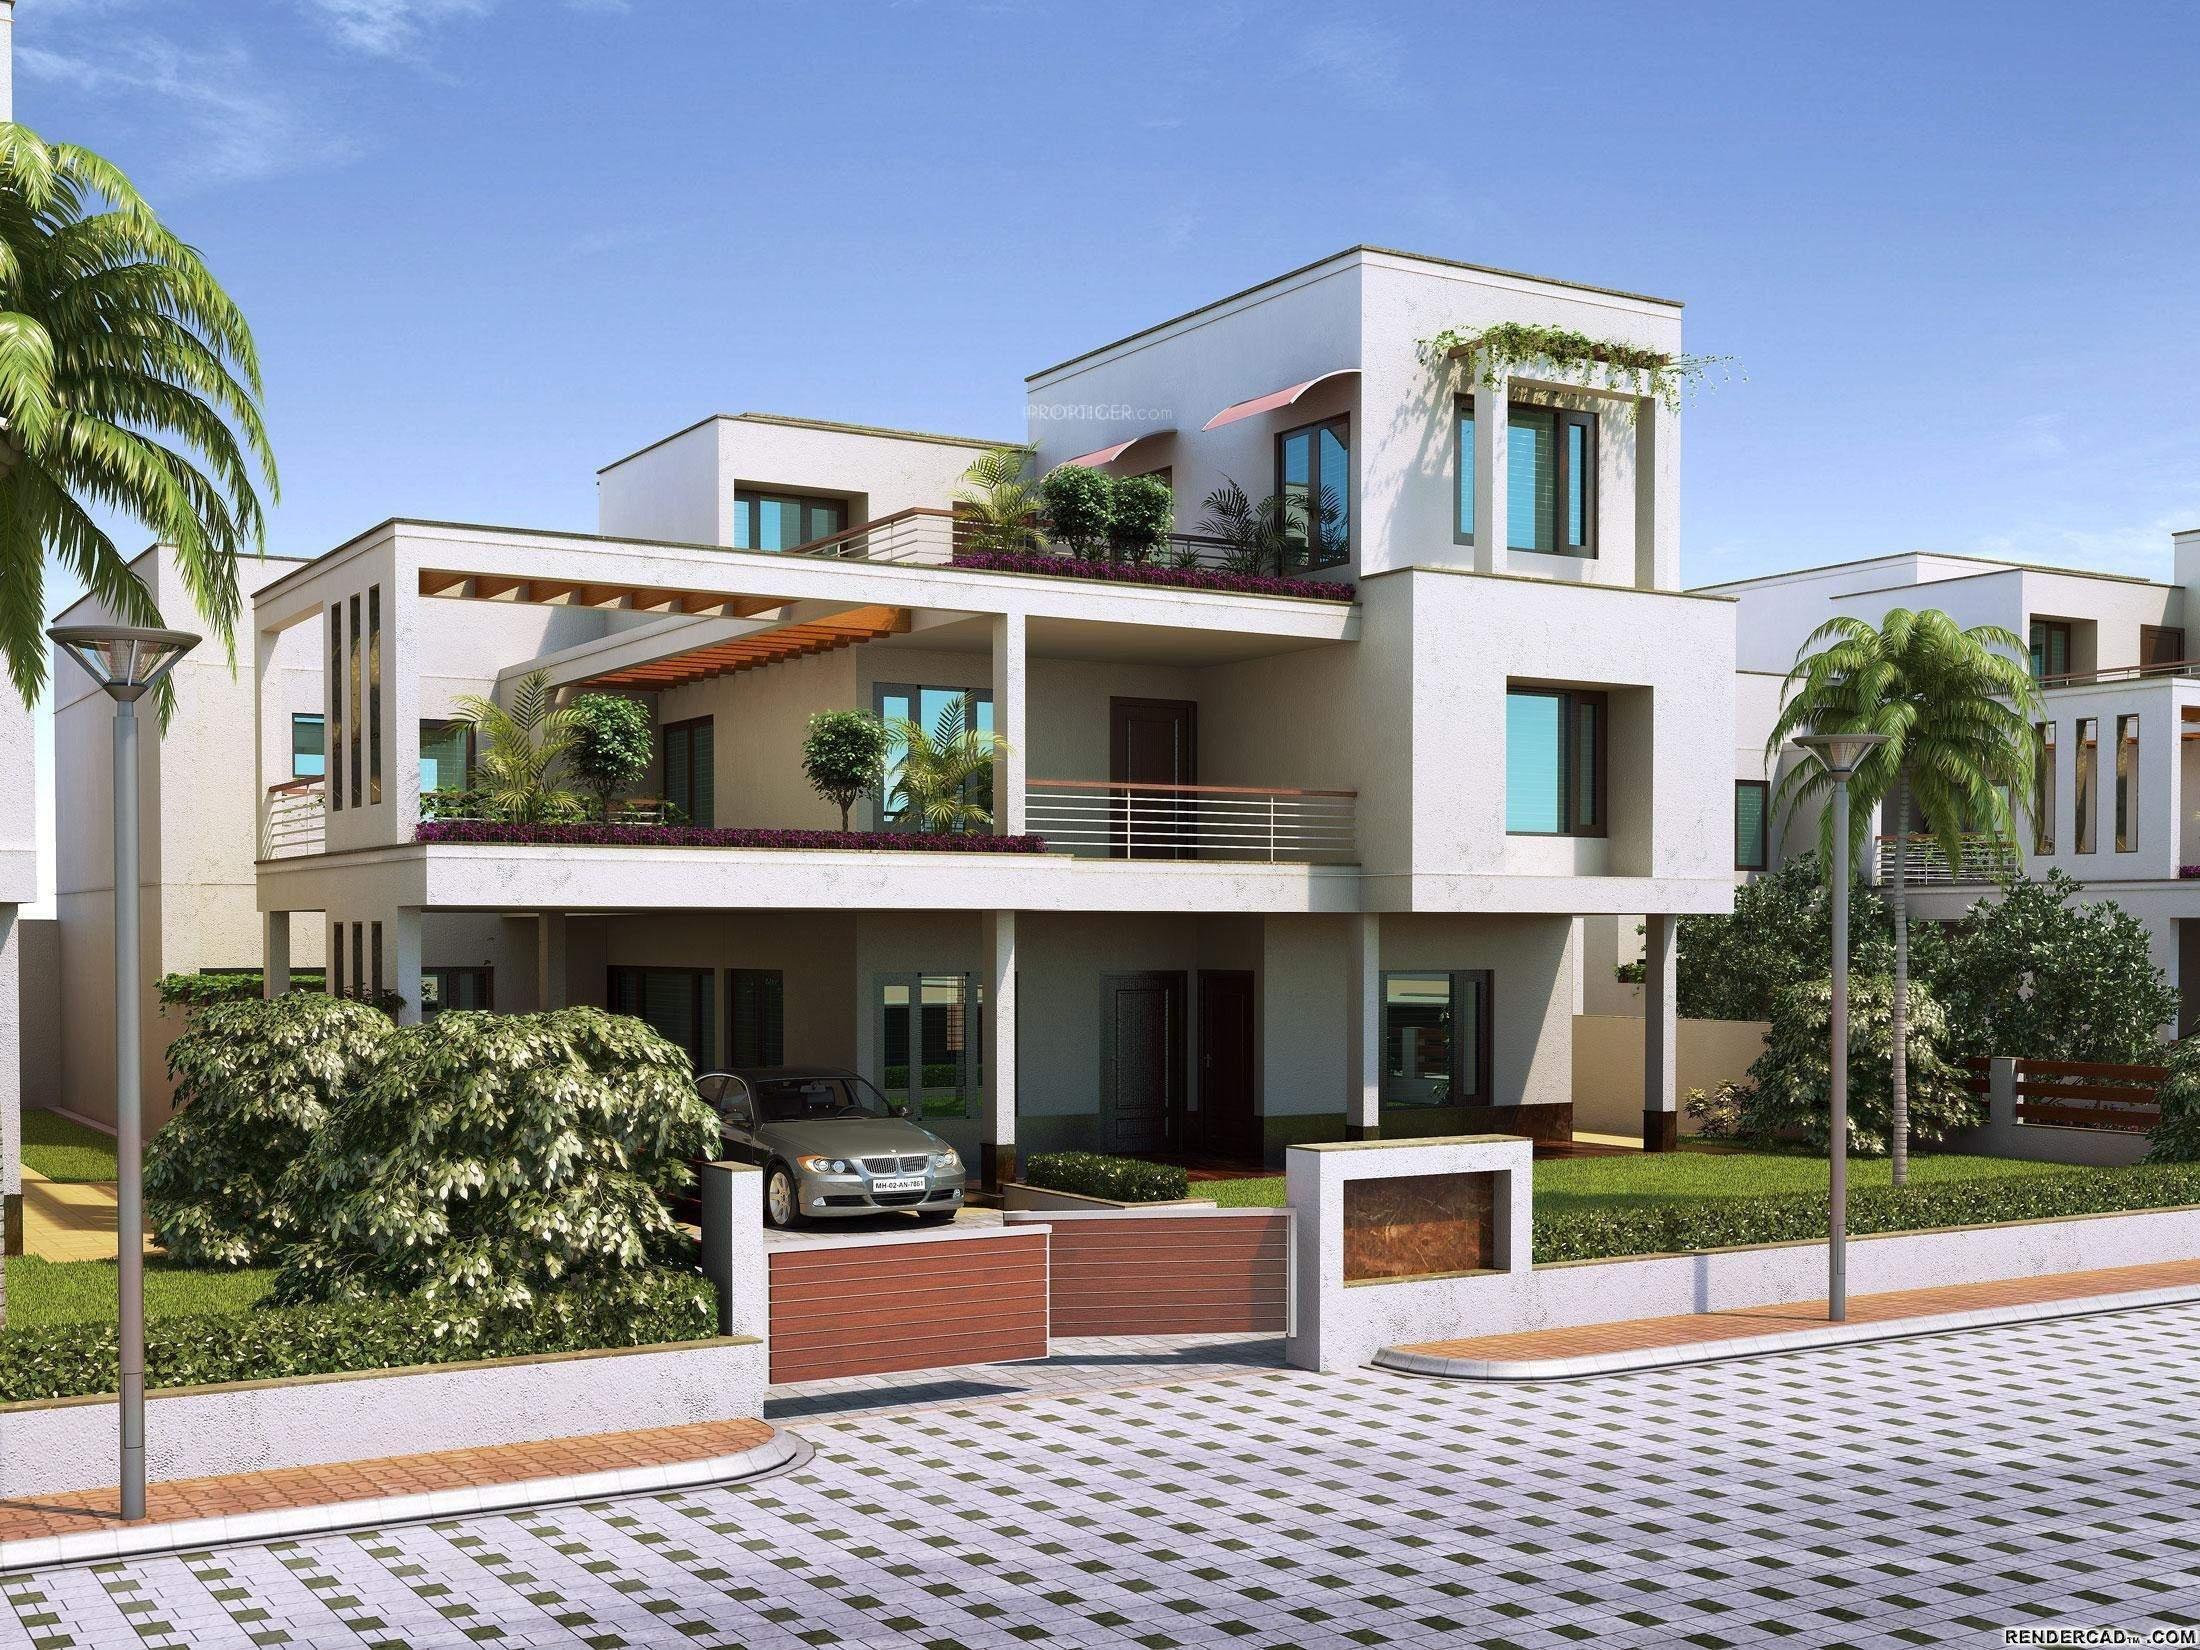 1 Bedroom Modular Homes Floor Plans Amrit Pebble Bay Dream Villas In Bagmugalia Bhopal